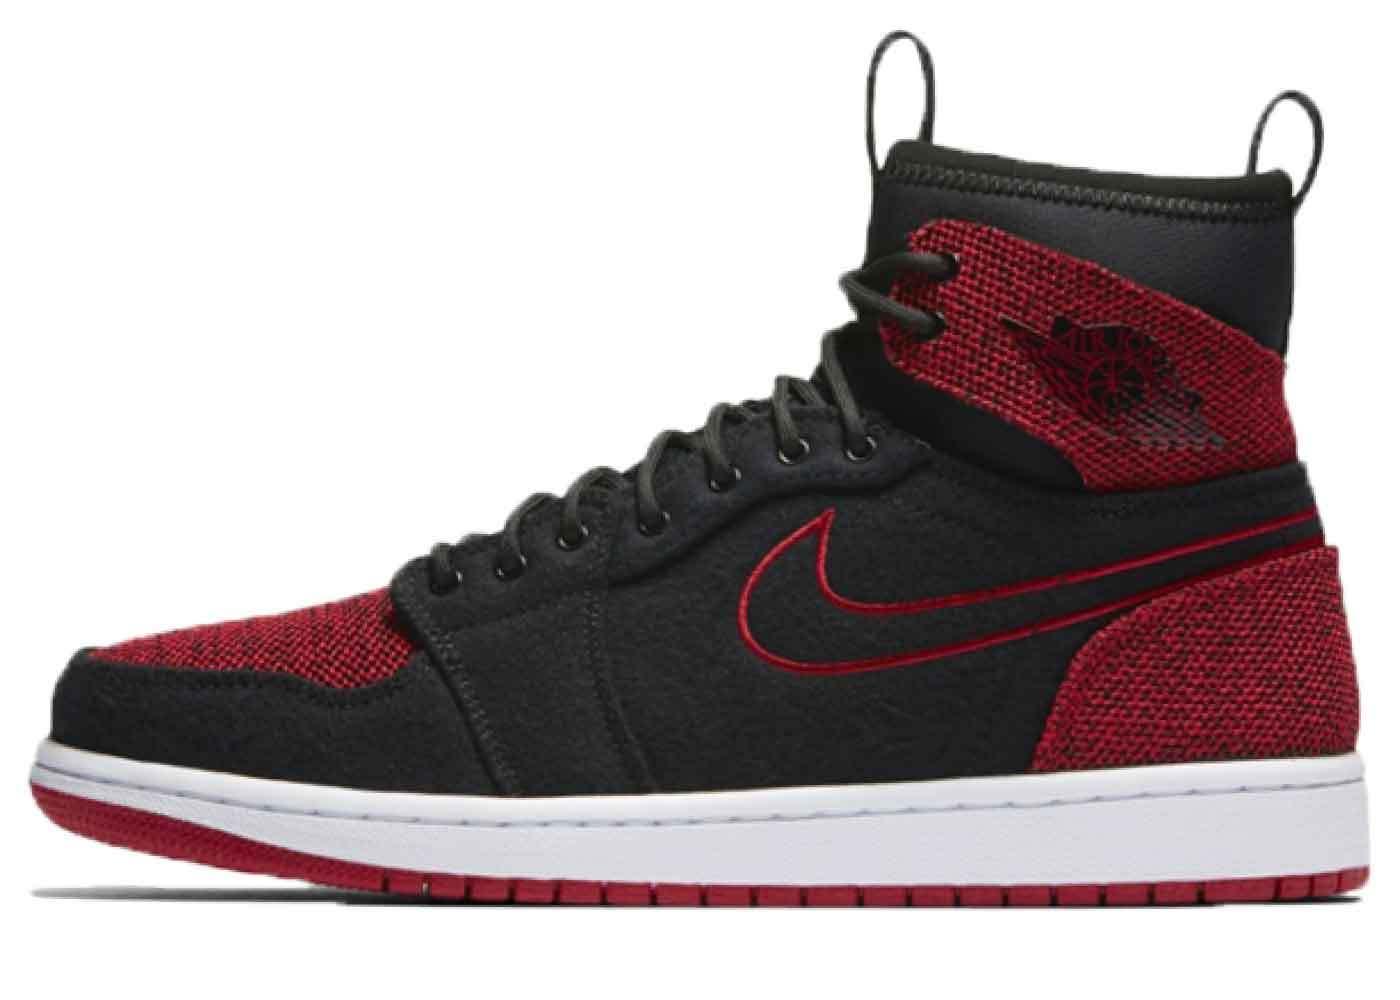 Nike Air Jordan 1 Retro Ultra High Bredの写真